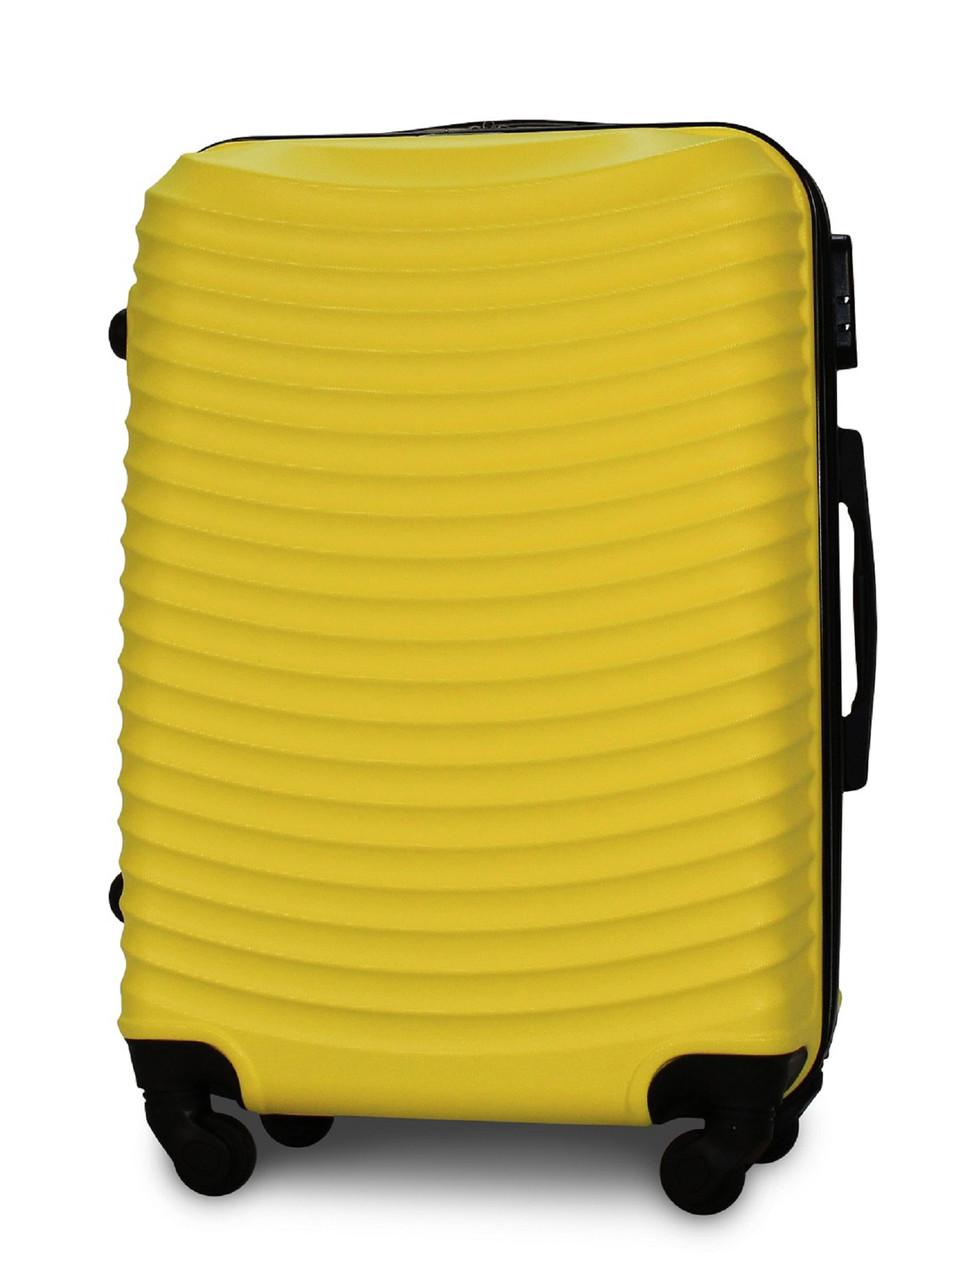 Чемодан Fly 1053 средний 65х42х24 см 60л пластиковый на 4 колесах Желтый